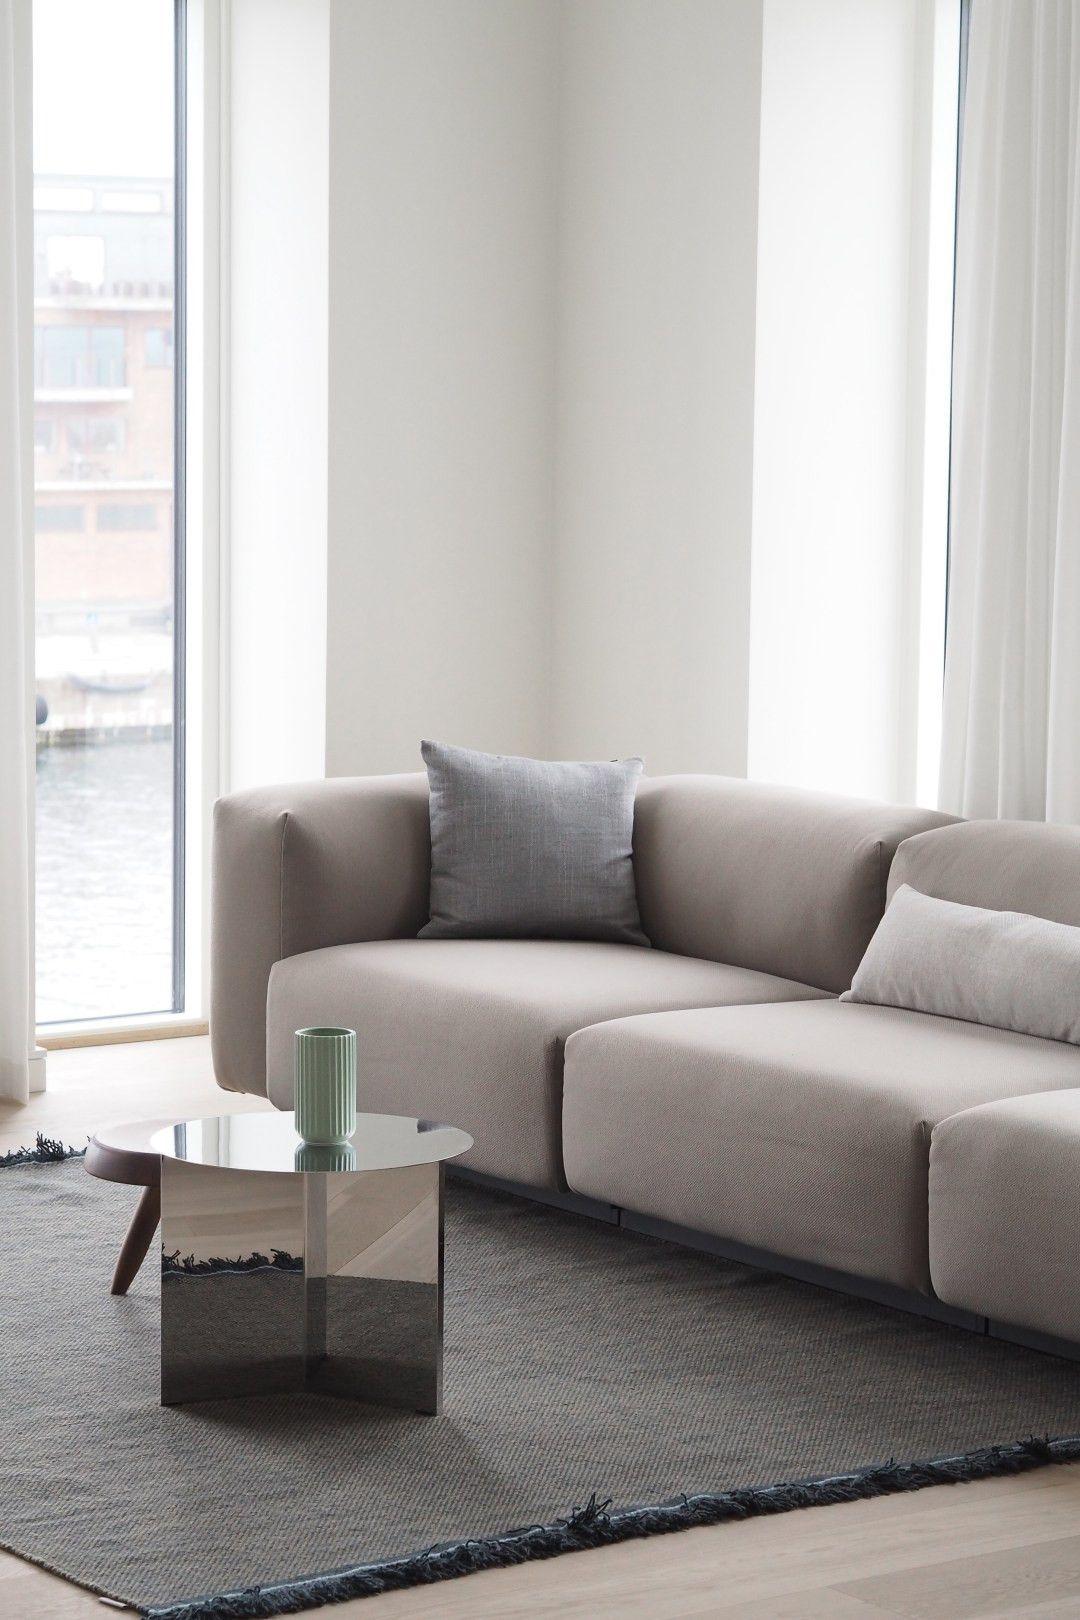 Scandinavian Designs Near Me Toronto 2021 Sofa Inspiration Scandinavian Design Minimal Living Room